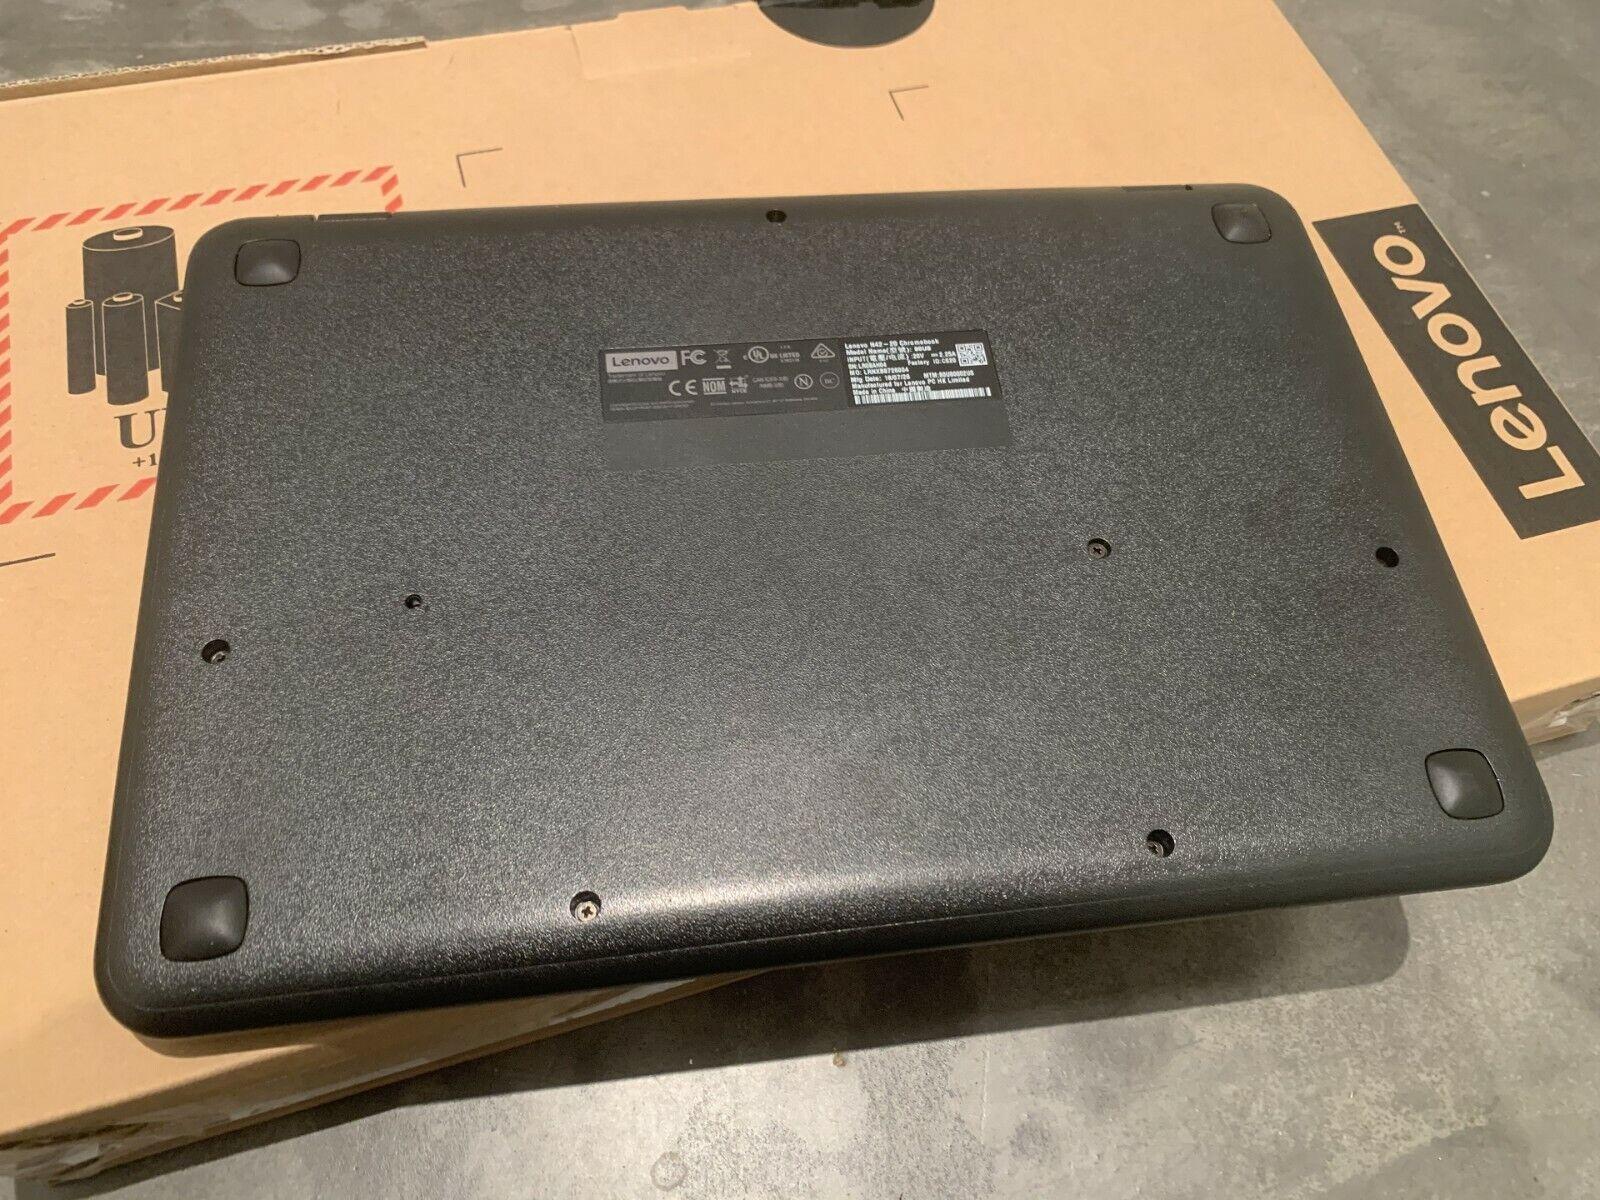 Lenovo thinkpad chromebook n42 intel celeron n3060 4gb ram 32gb mmc bluetooth